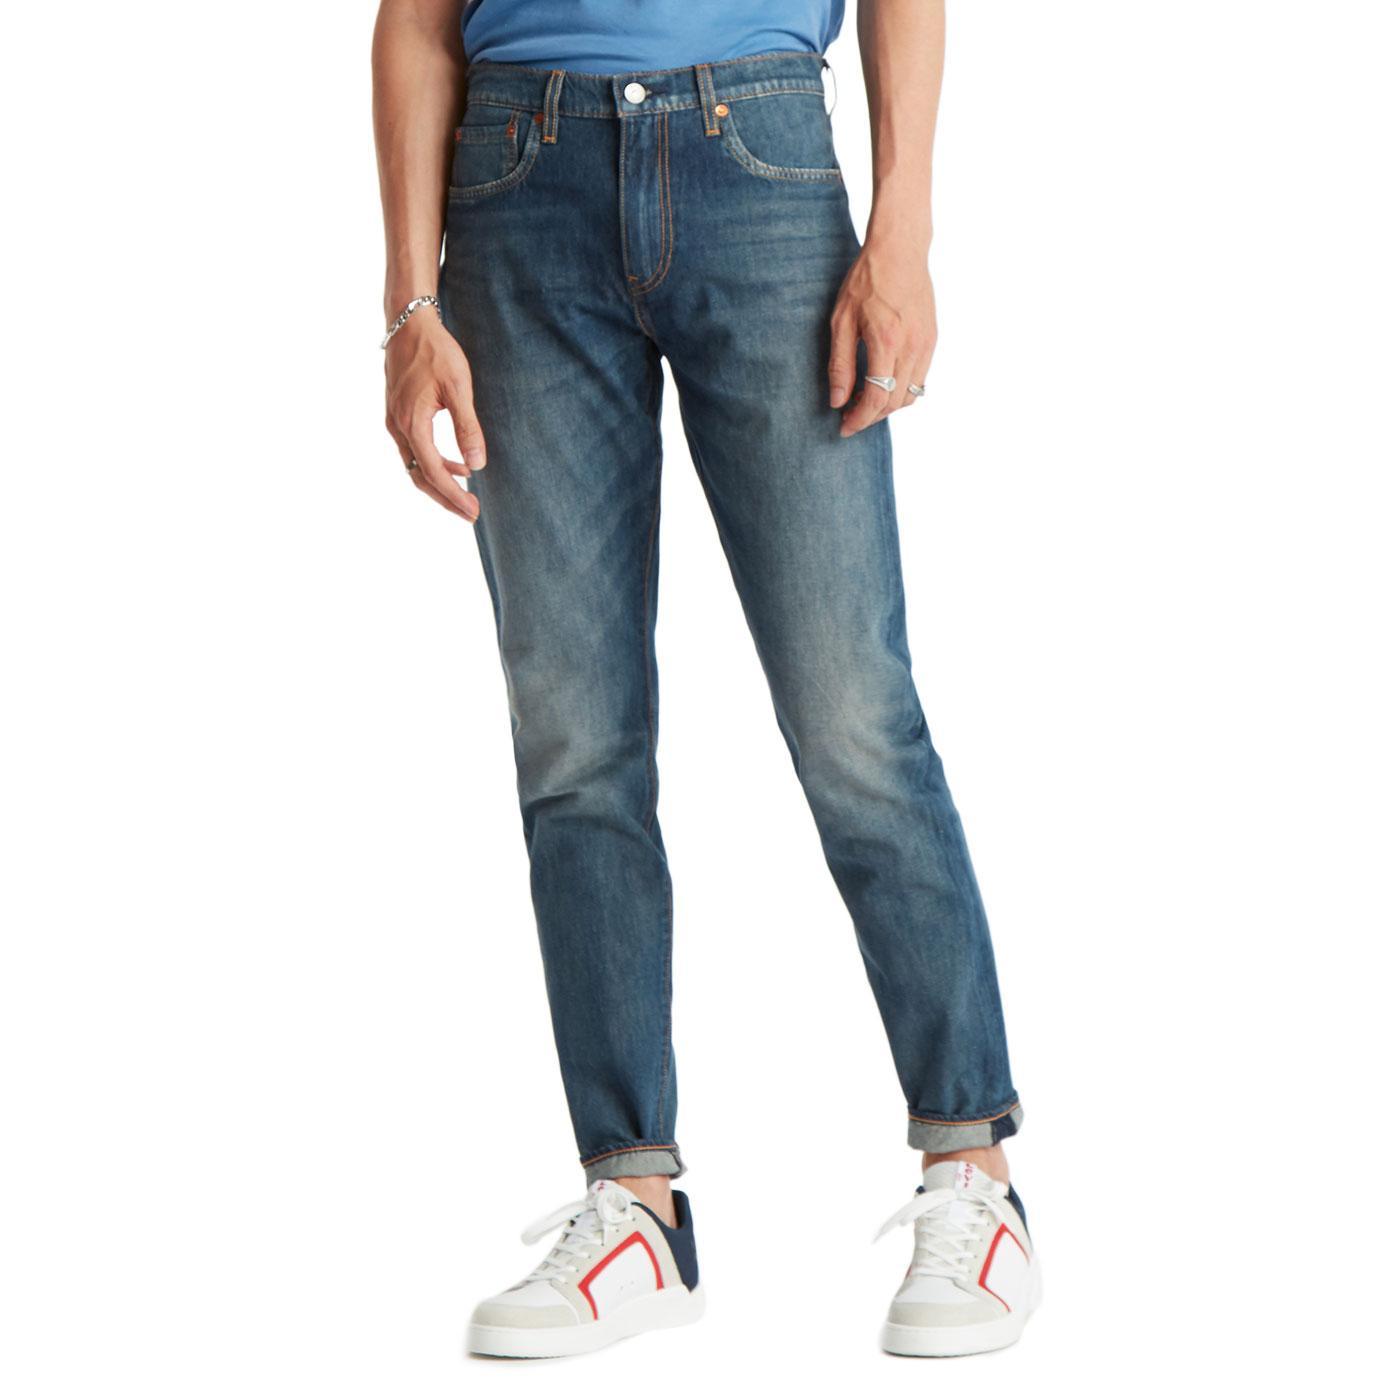 LEVI'S 512 Slim Taper Denim Jeans CIOCCOLATO COOL